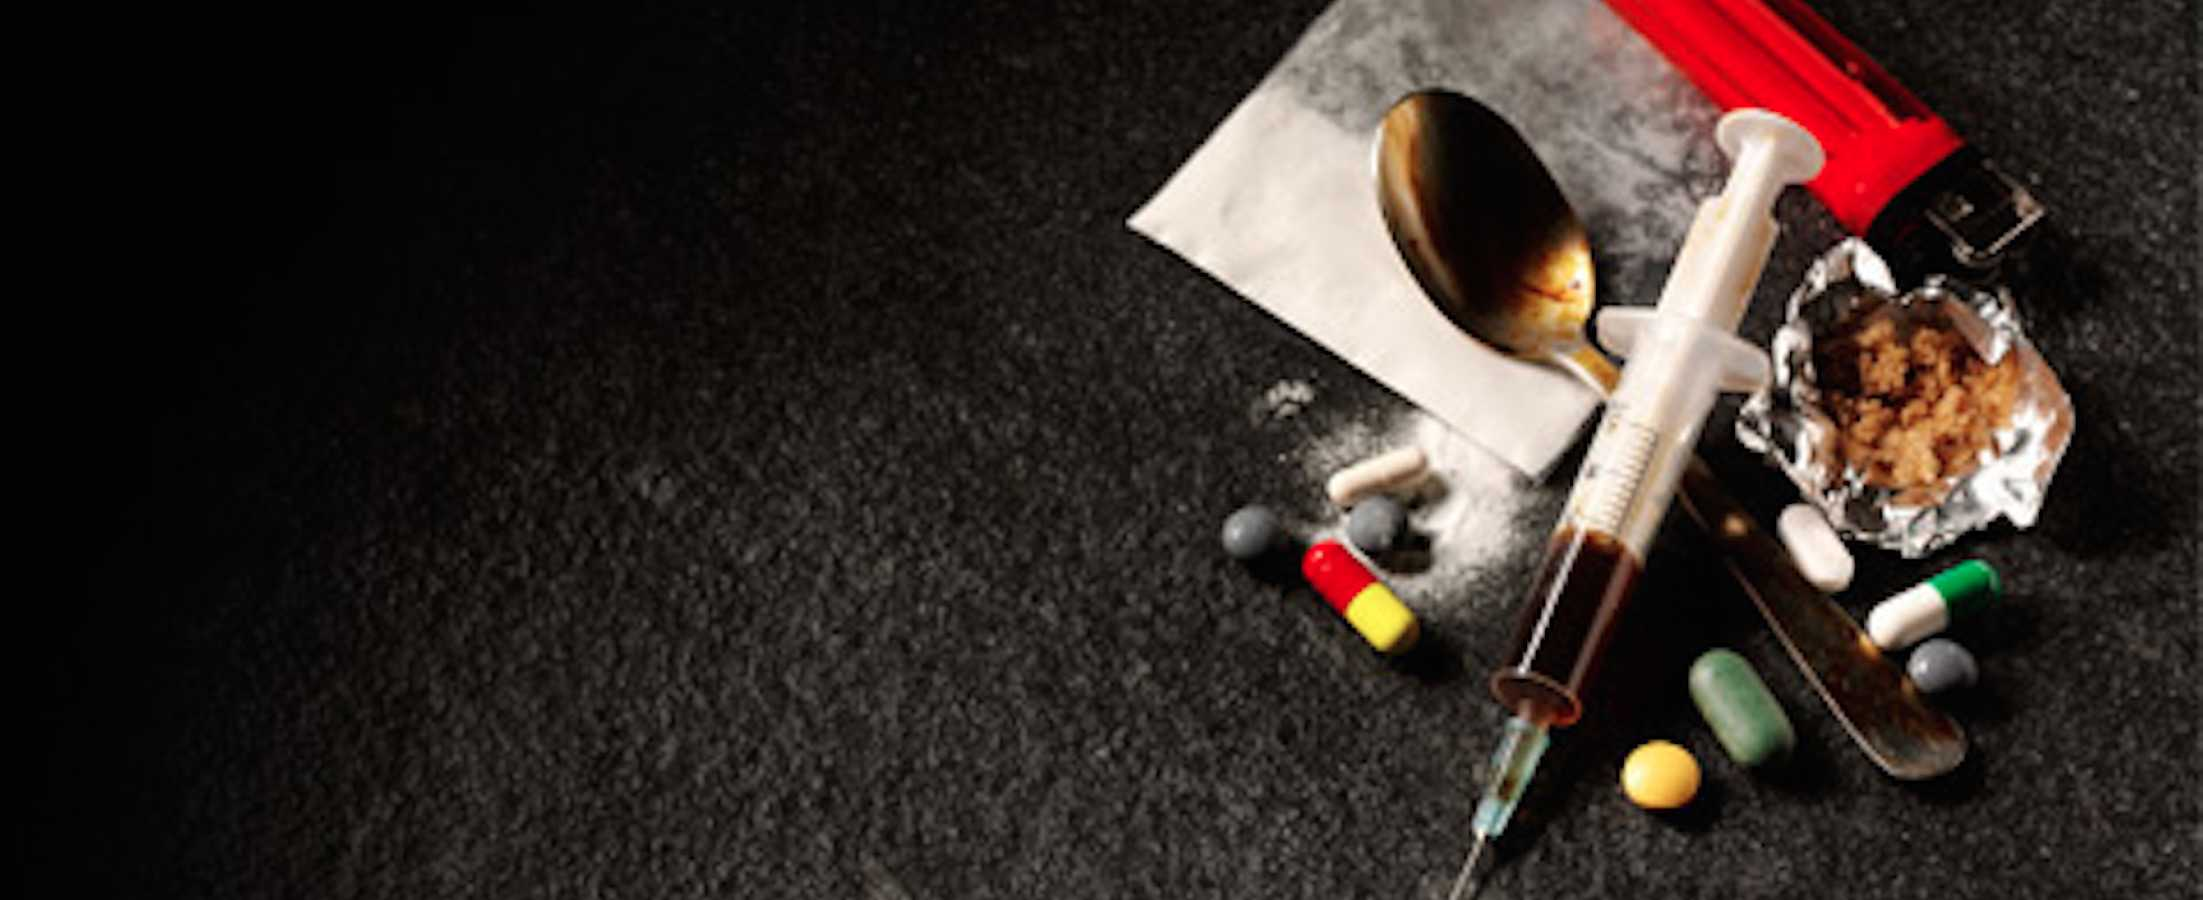 addiction paraphernalia like needle, spoon, pills and powders